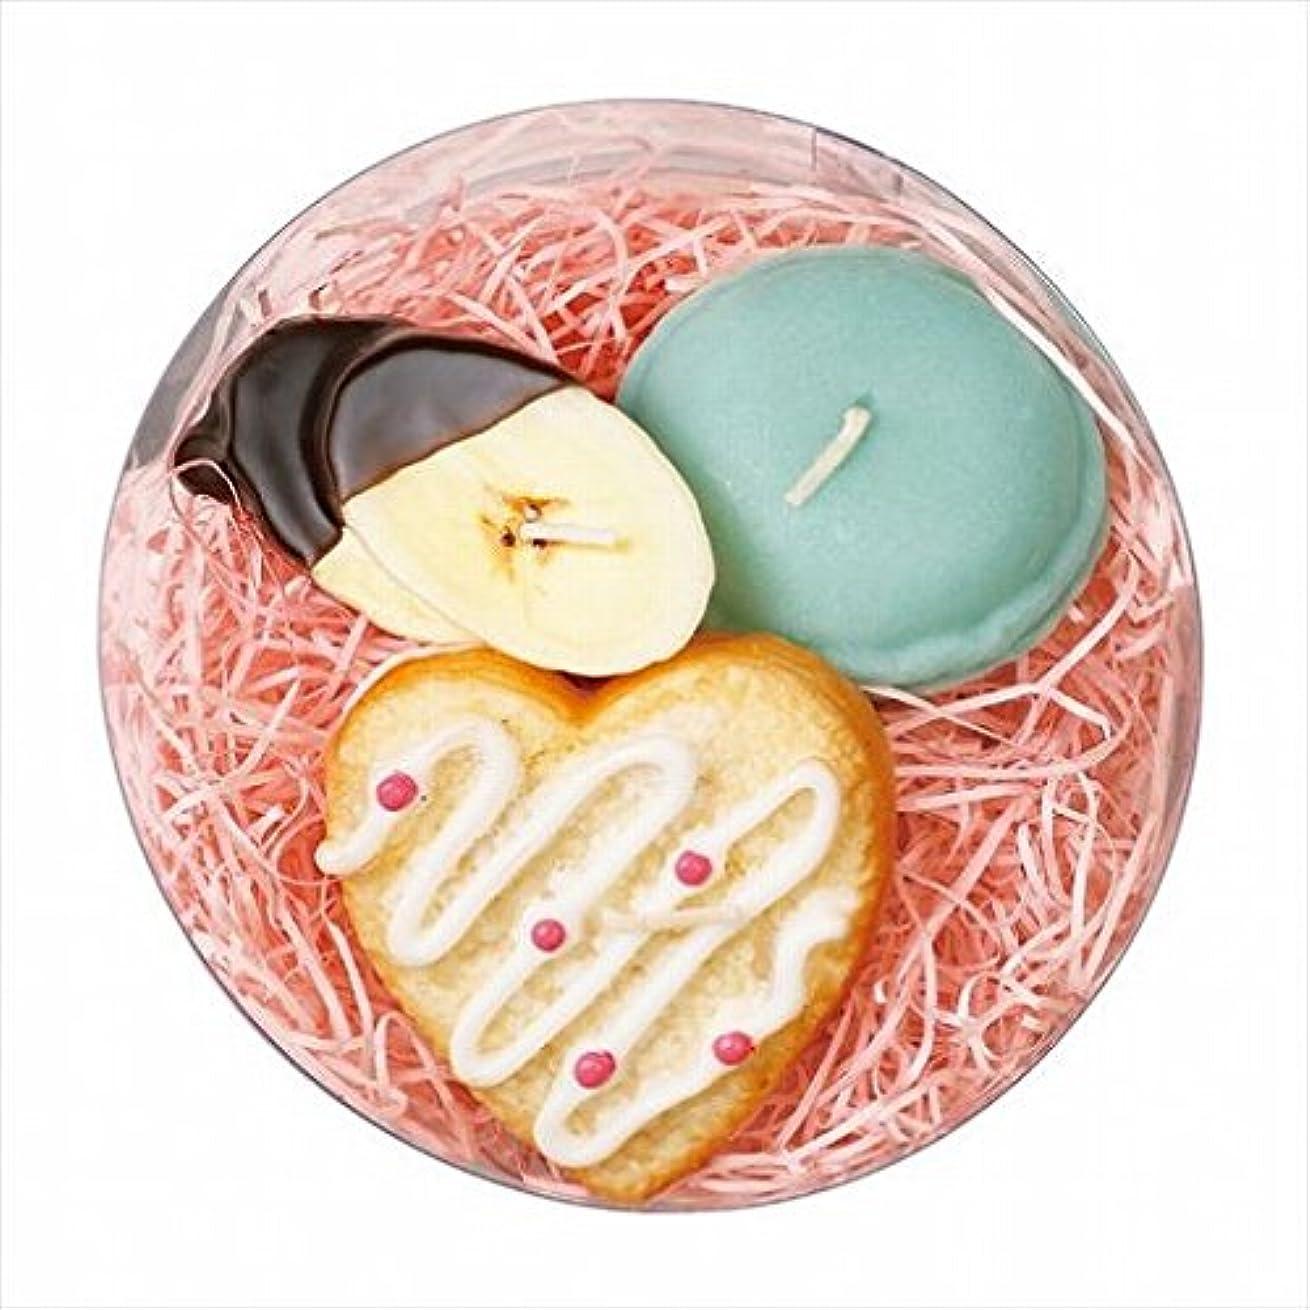 sweets candle プチスイーツキャンドルセット 「 シュガーハート 」